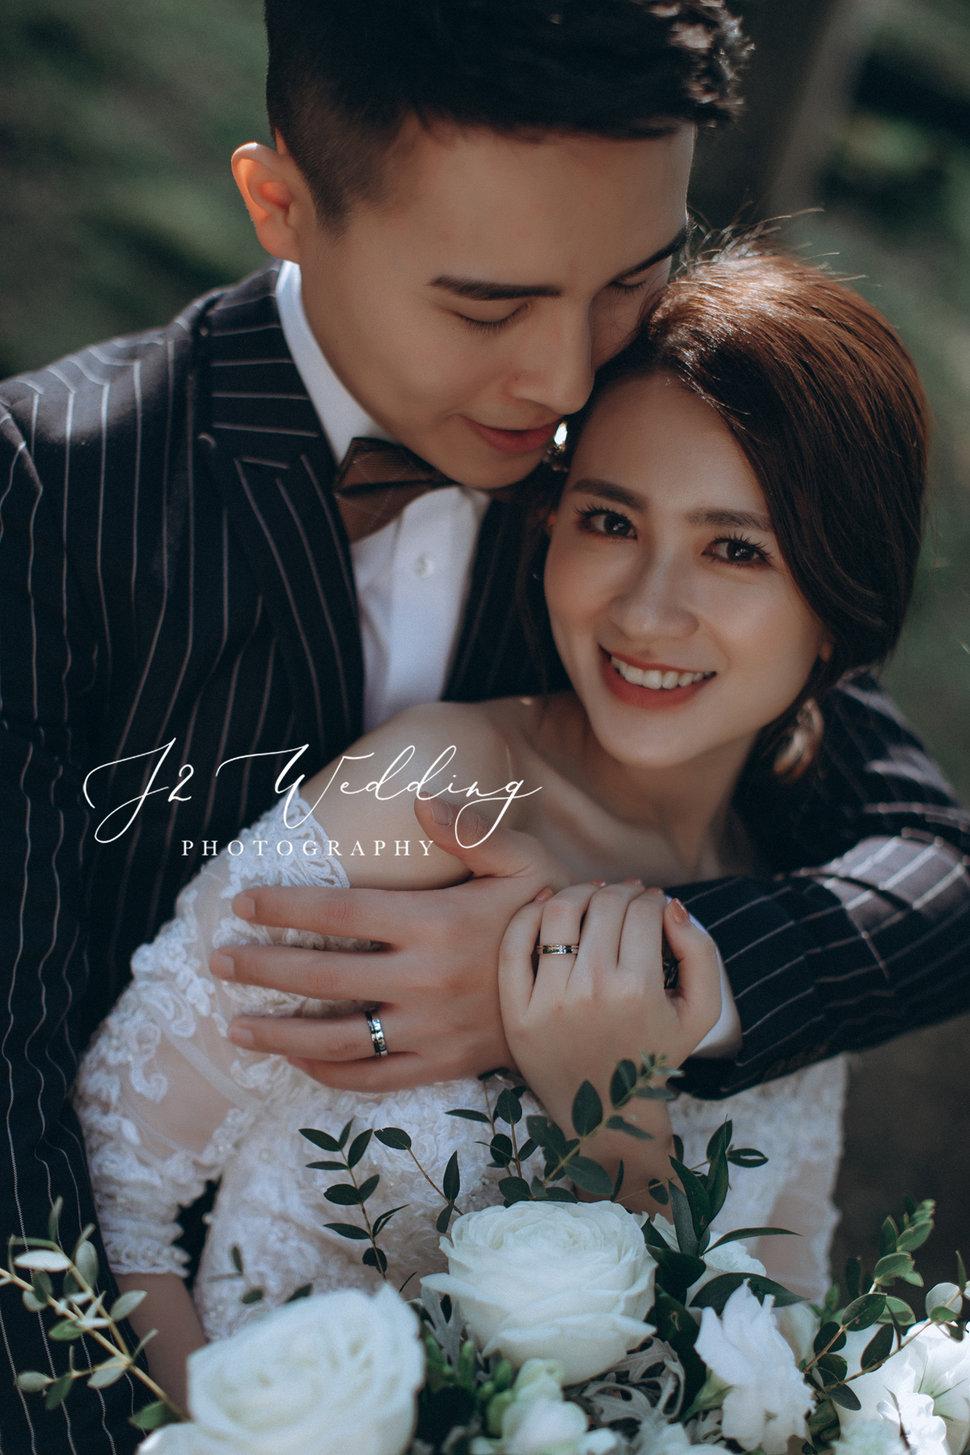 069A00035 - J2 wedding 中壢《結婚吧》